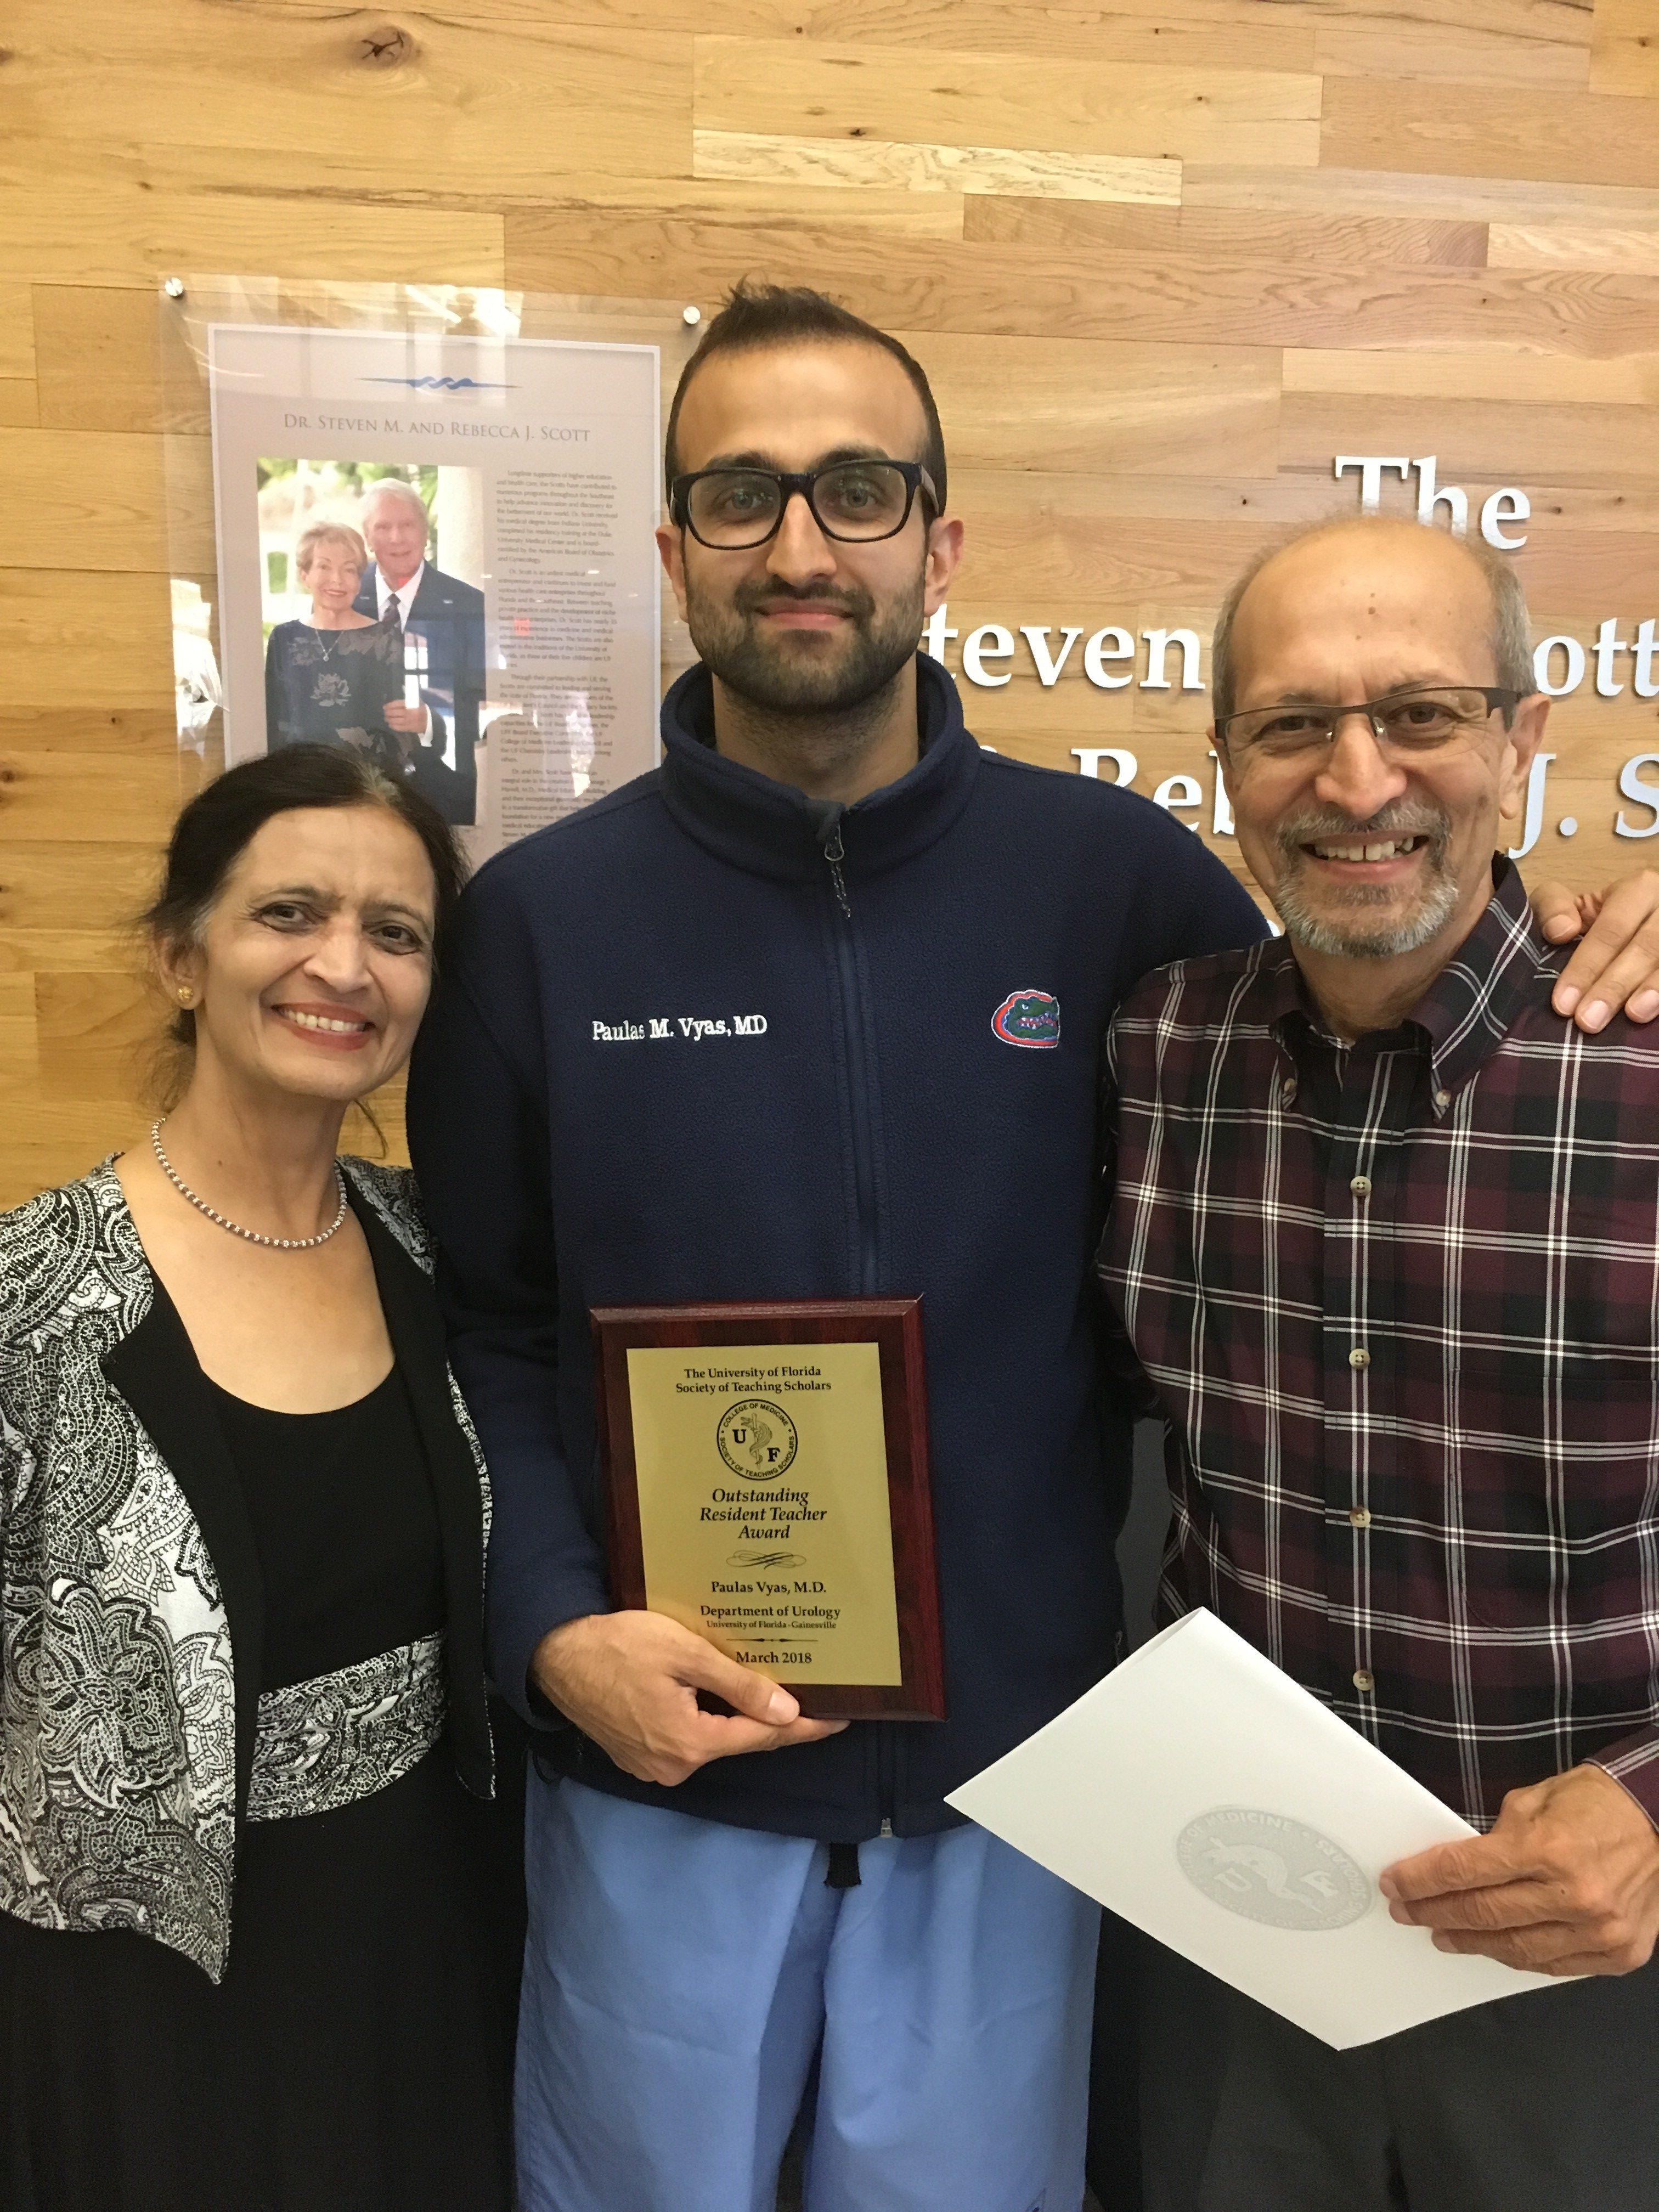 dr vyuas and parents